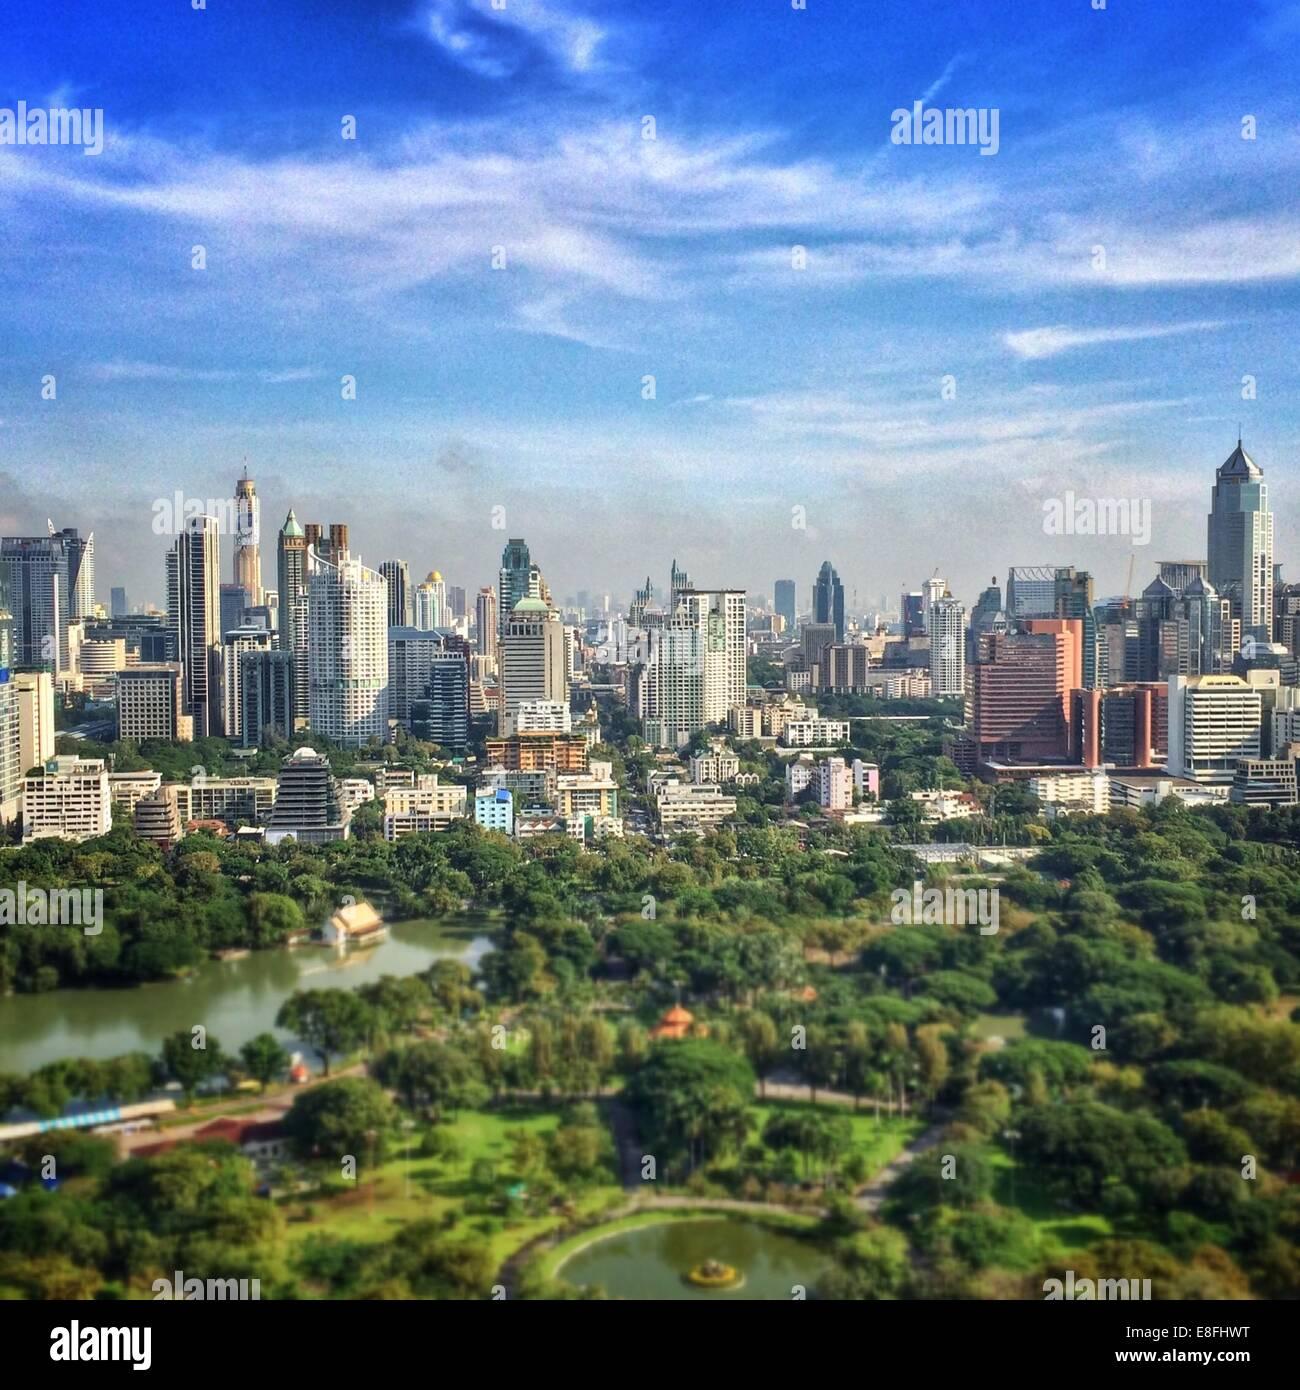 Thailand, Bangkok, erhöhten Blick auf Stadtbild Stockbild